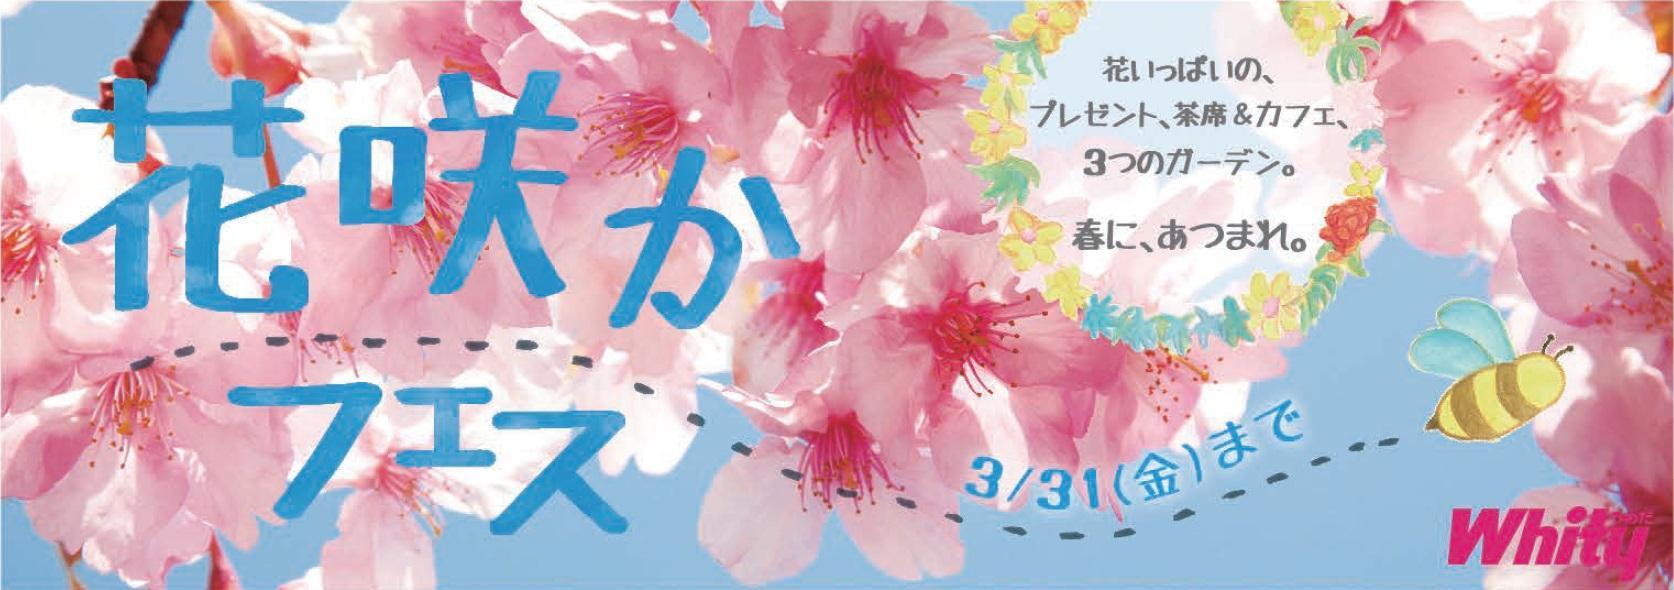 20170306151300_hanasaka_banner1.jpg